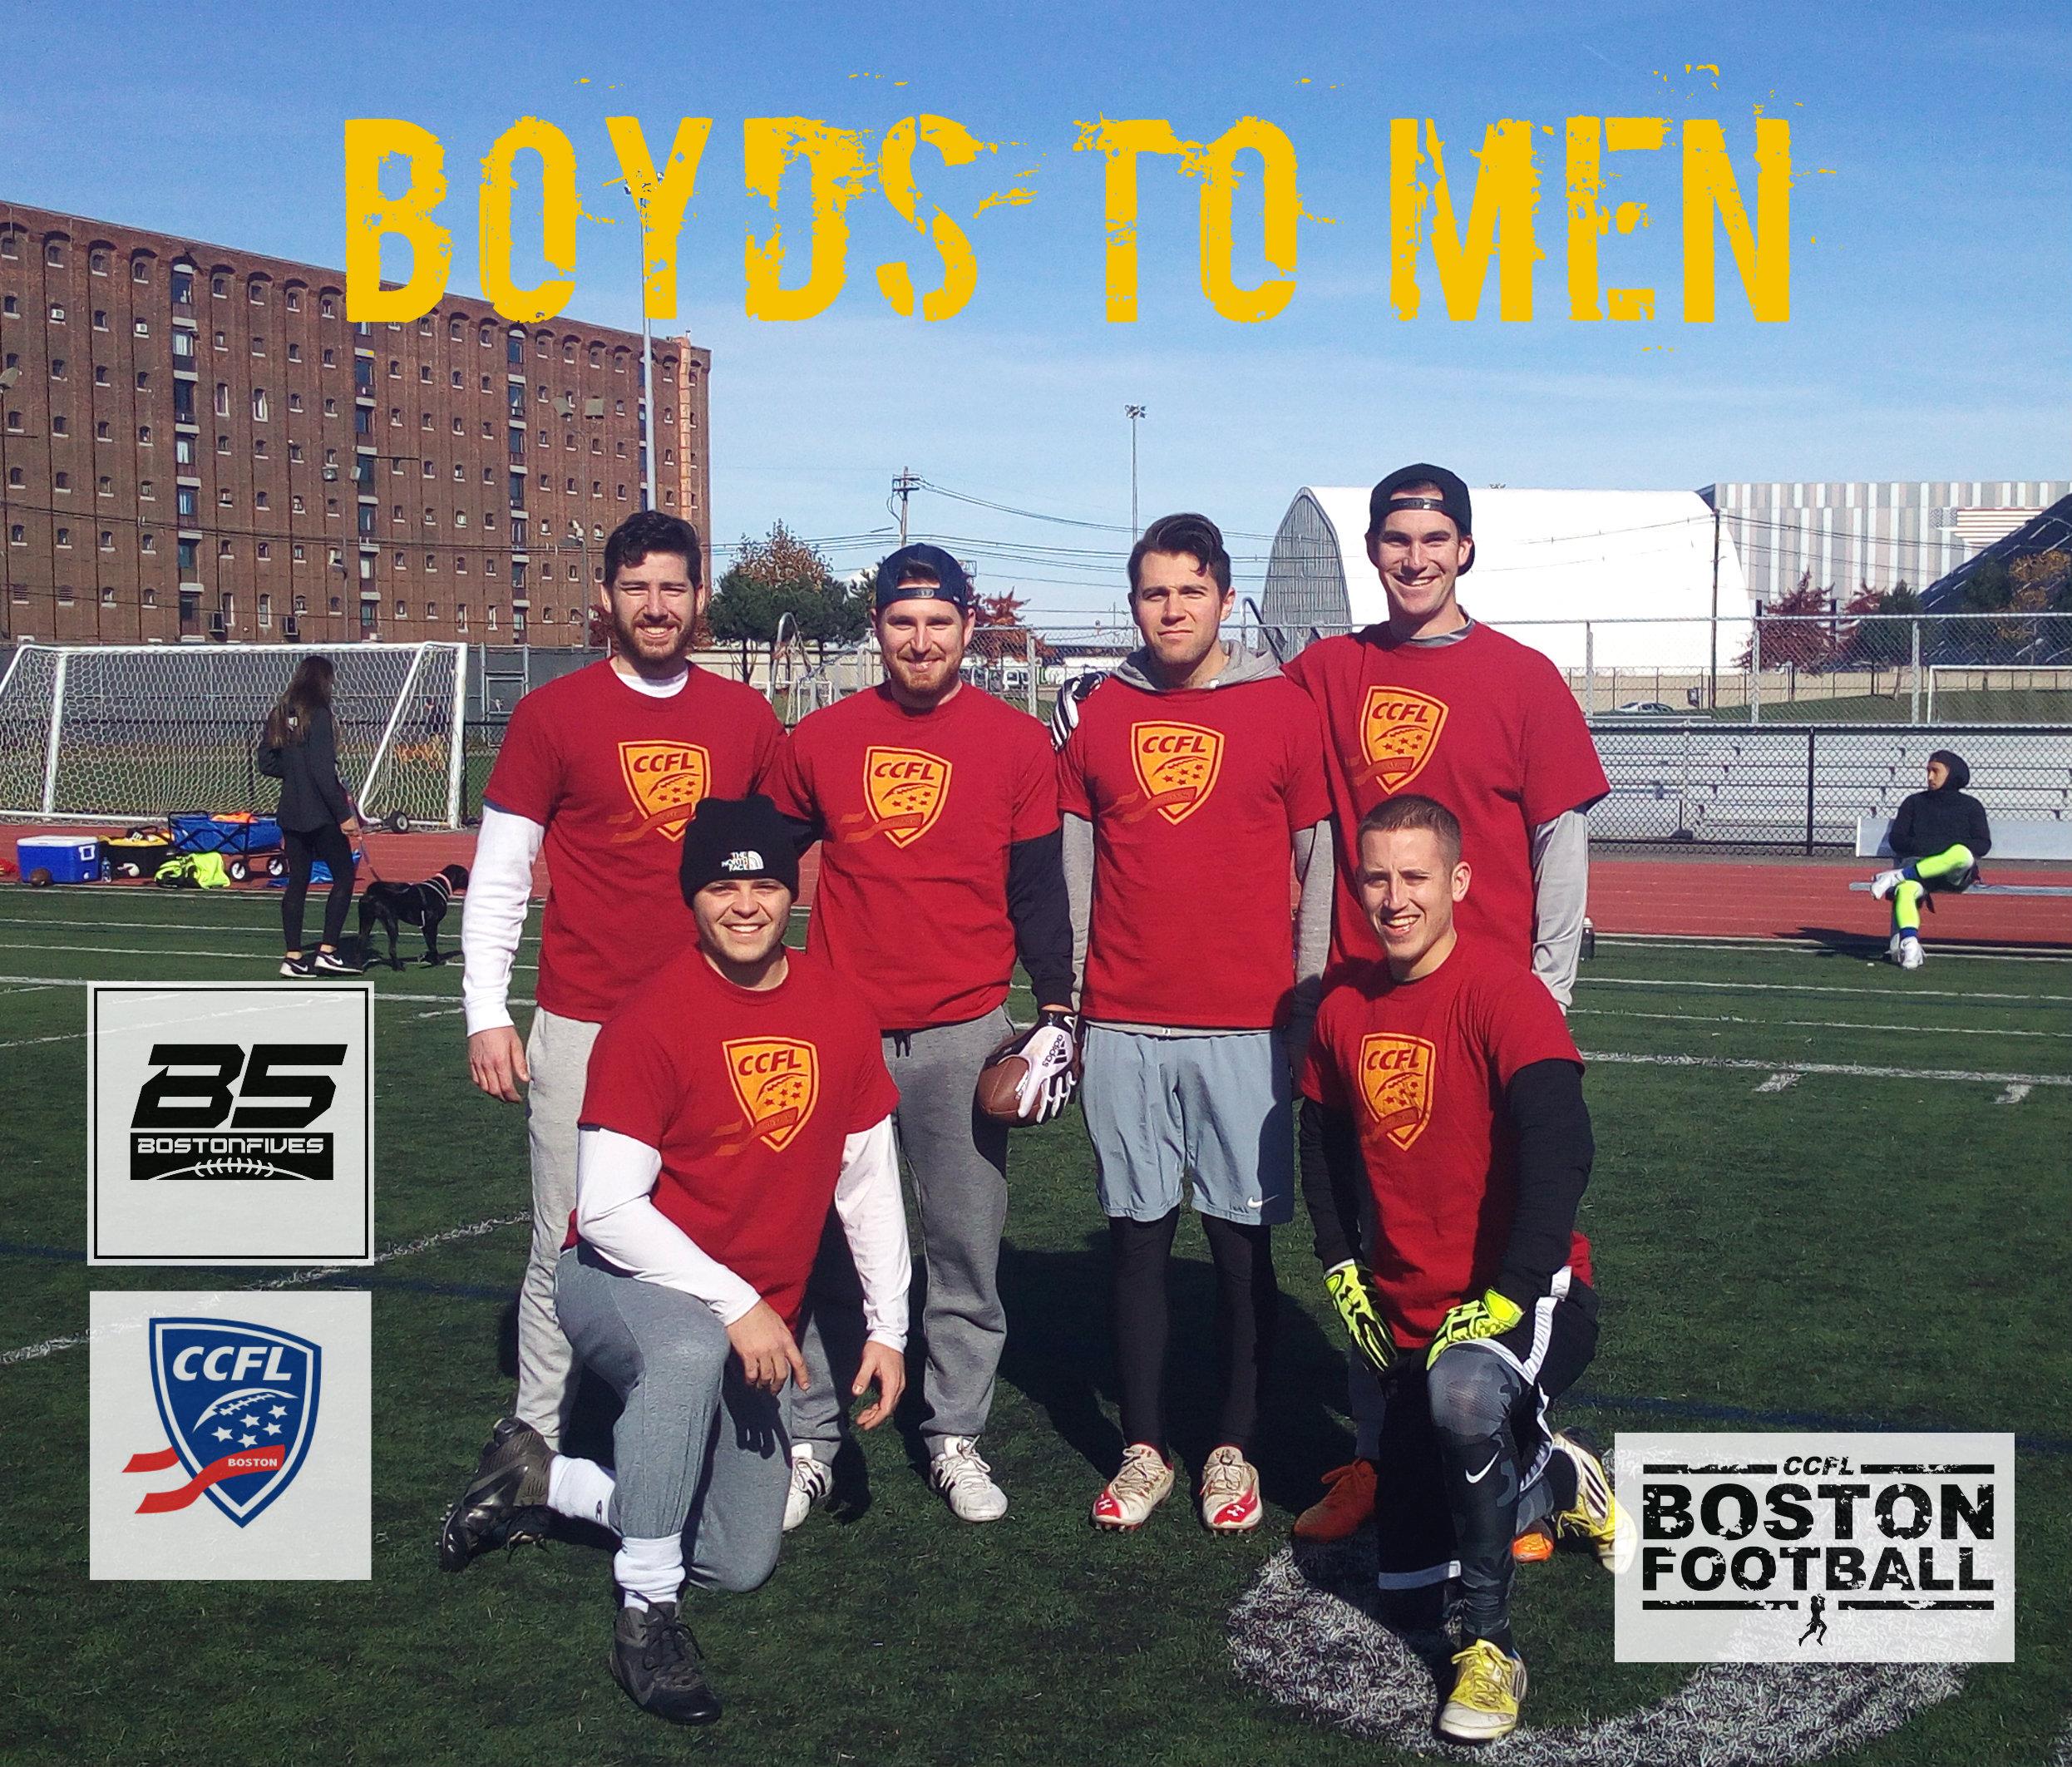 Boyds To Men